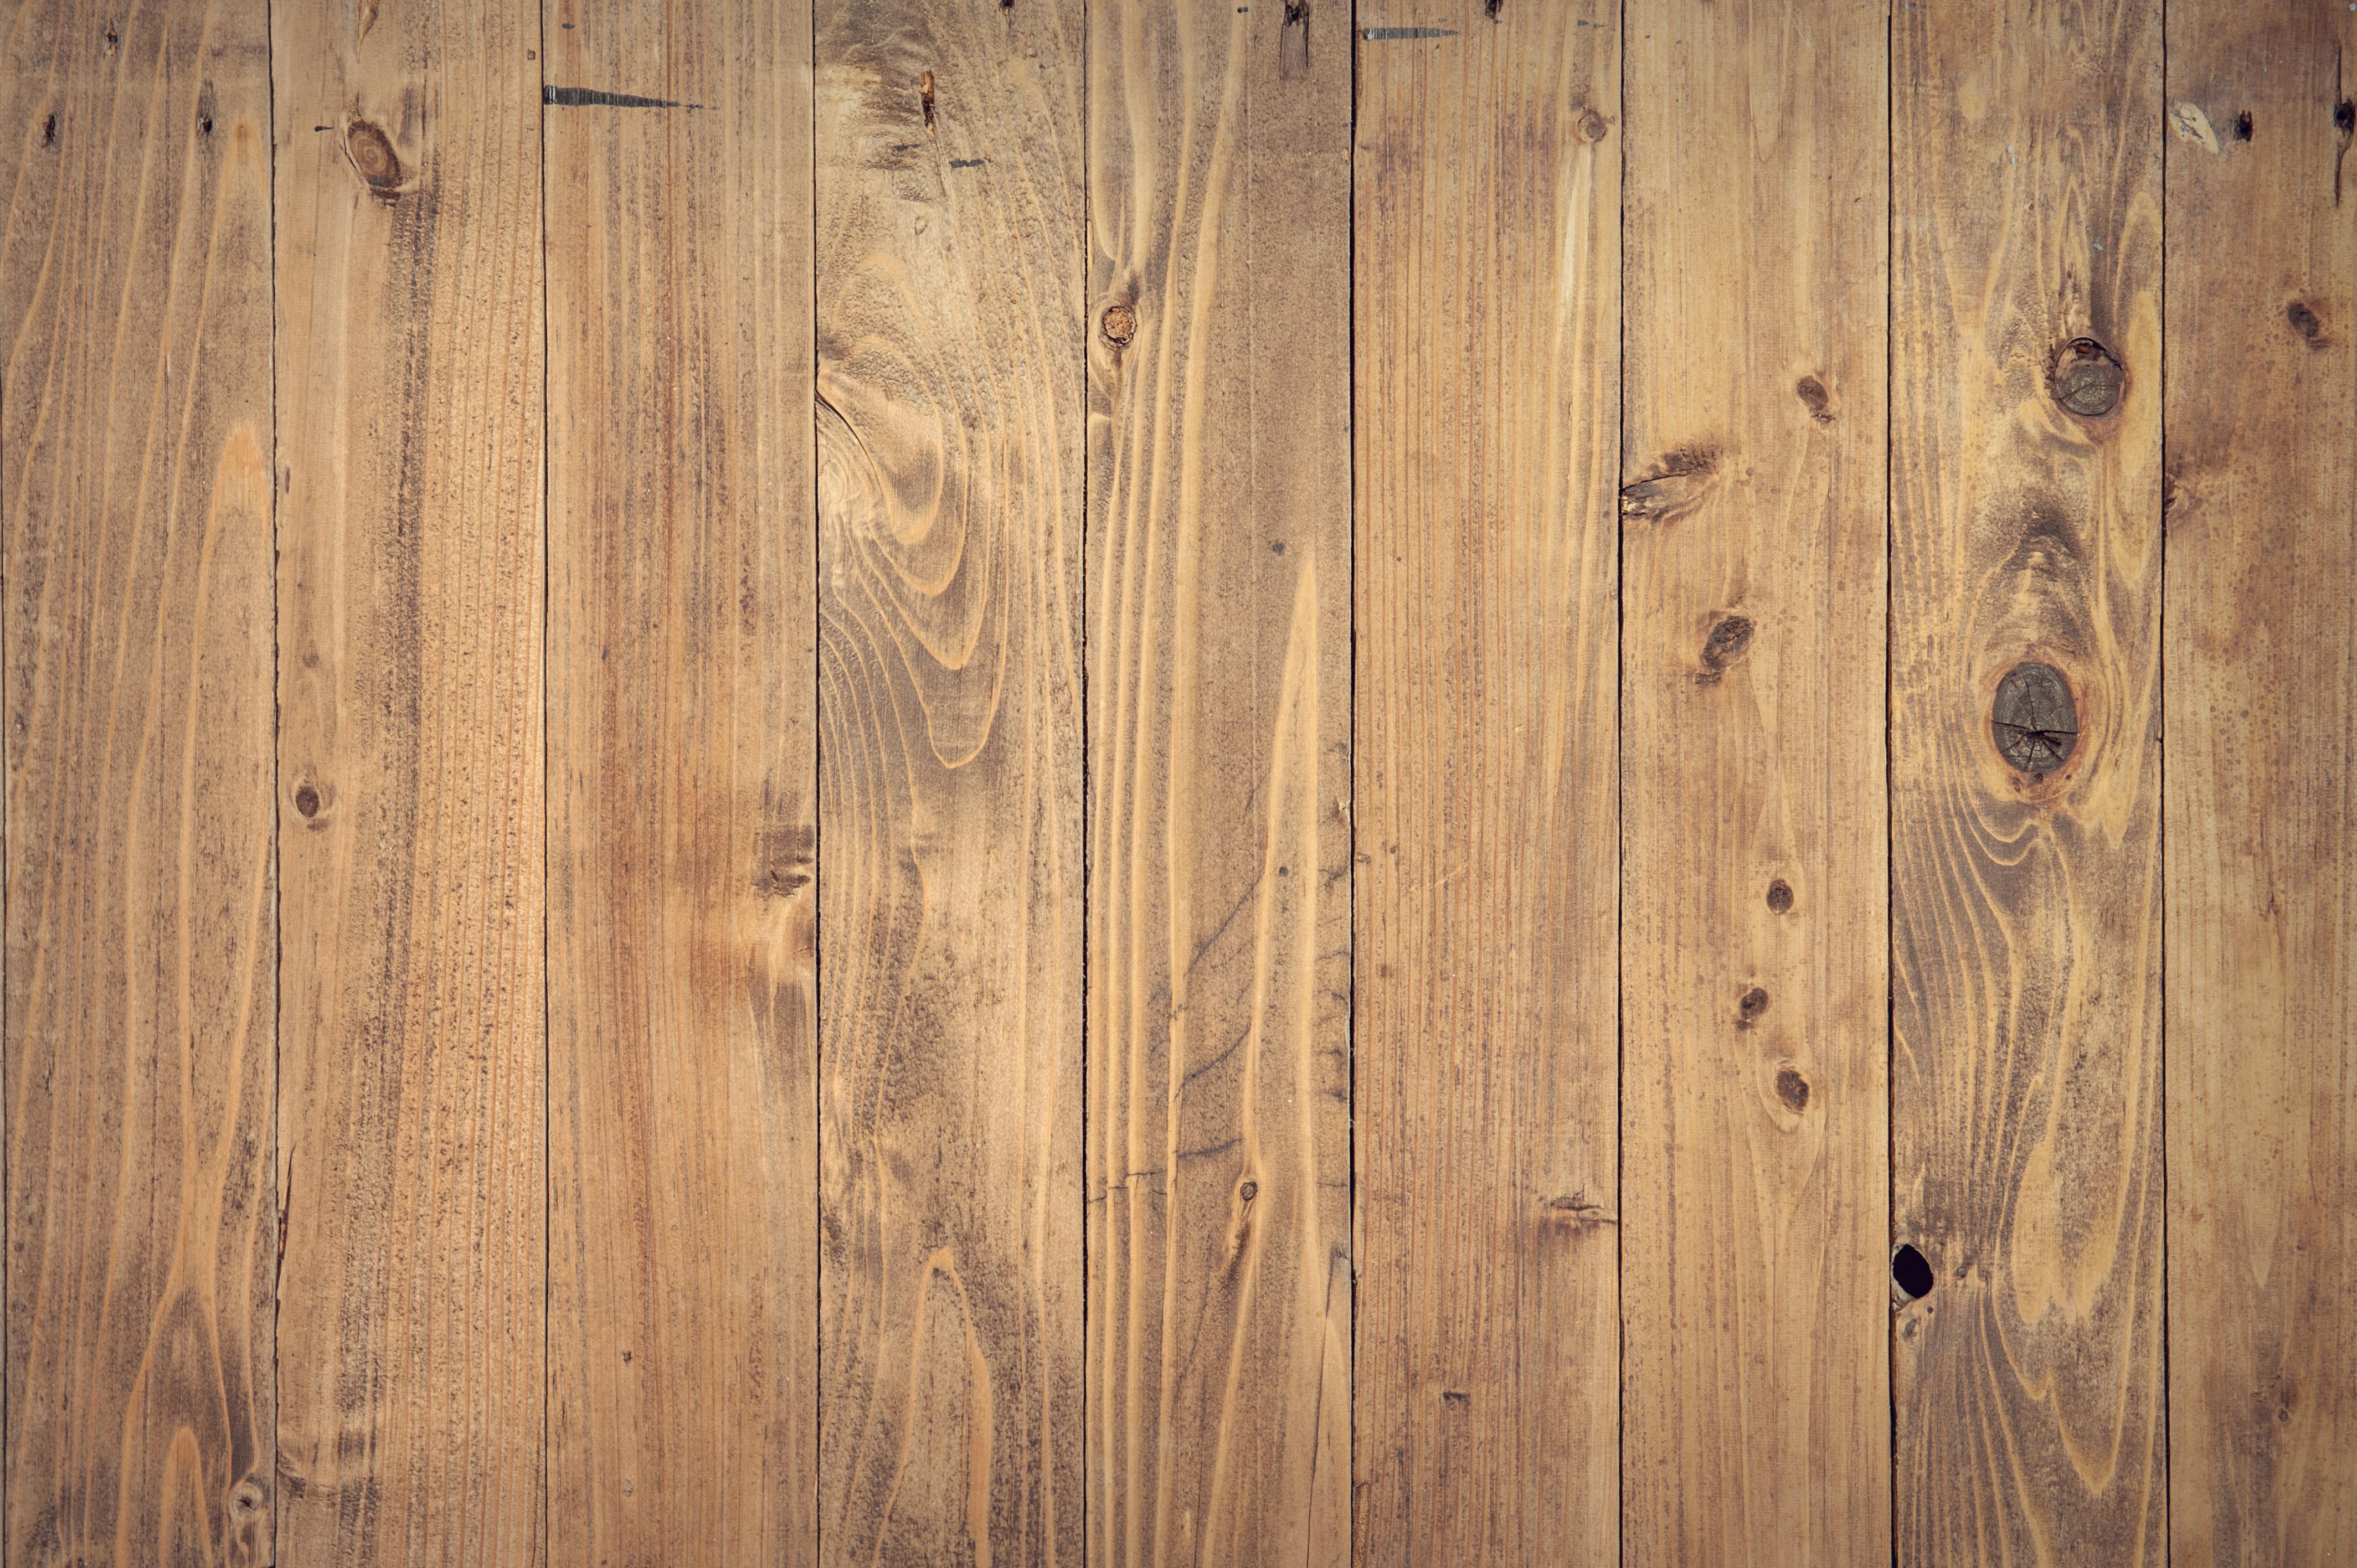 Free stock photos of wood background Pexels